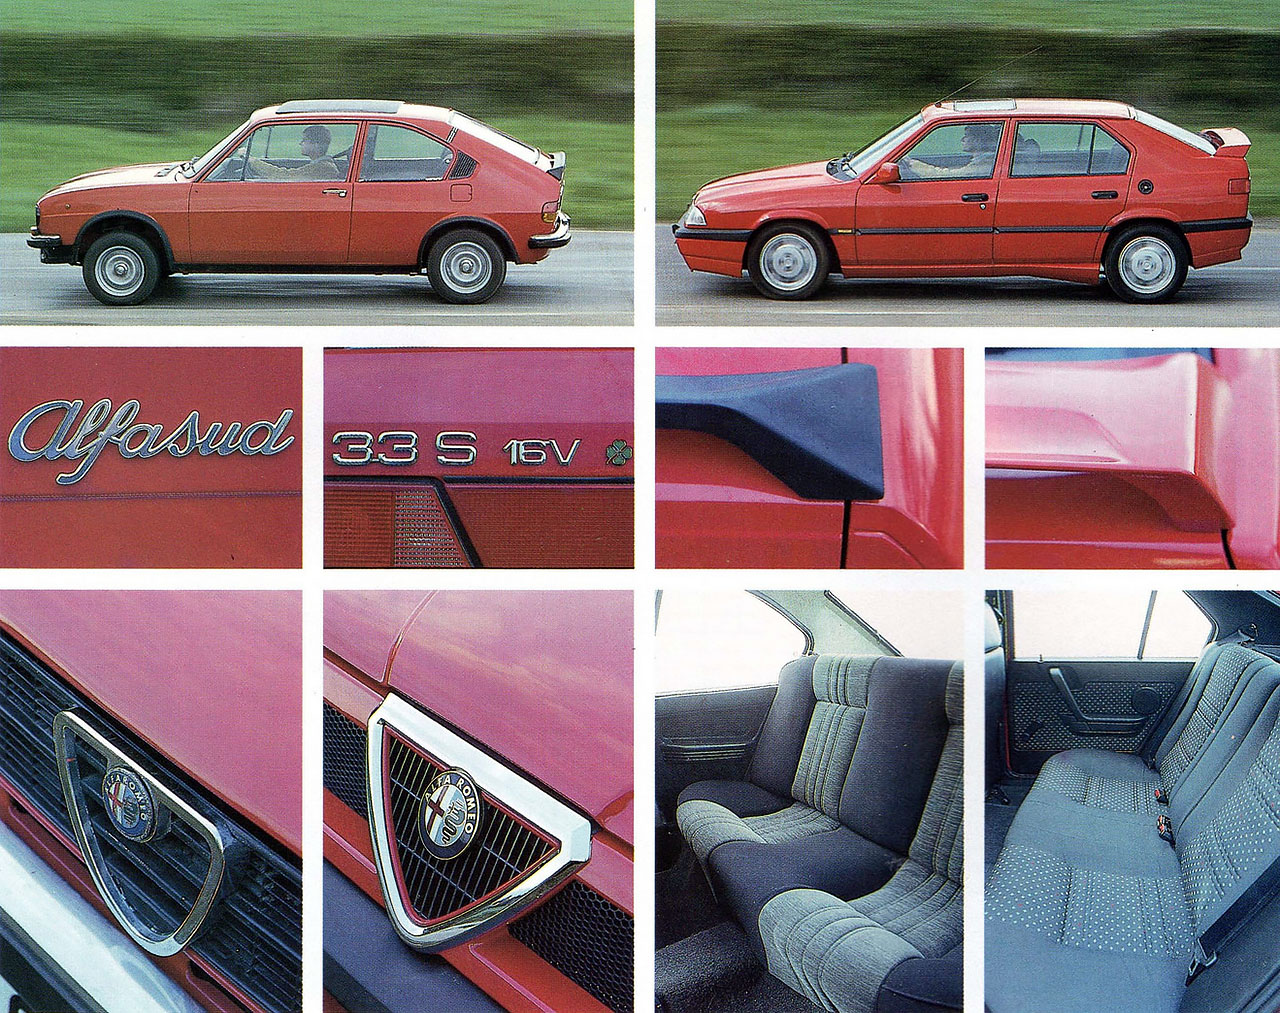 1971 Alfasud 1.5Ti vs. 1991 Alfa Romeo 33 Permanent 4